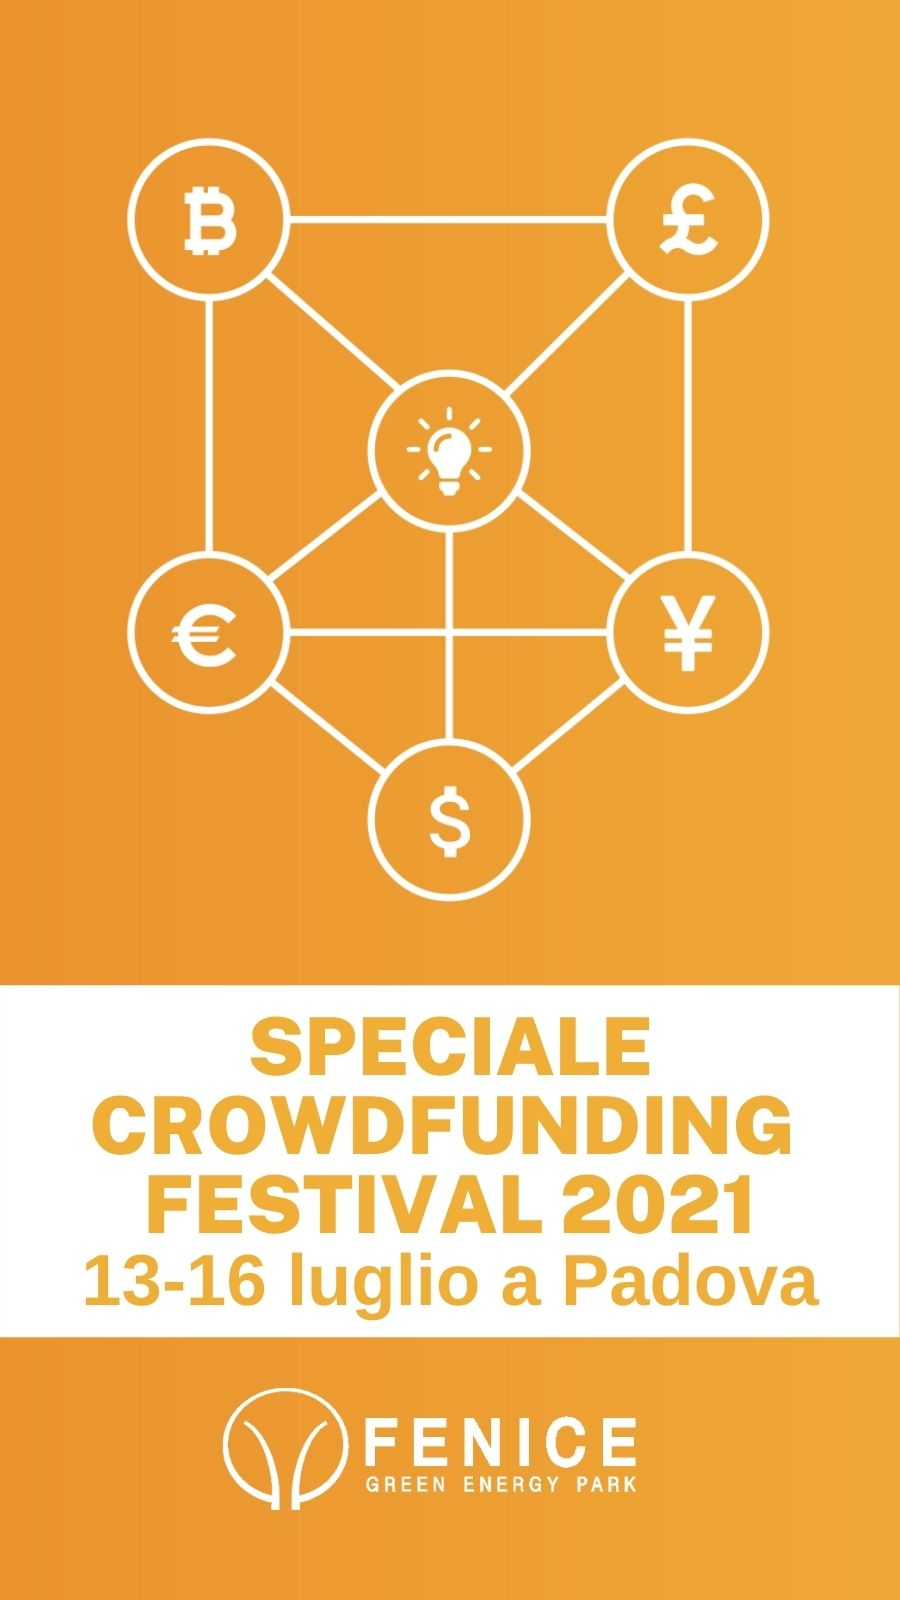 Crowdfunding-Festival-2021-Fenice-TV7-LOCANDINA-PROGRAMMI-916